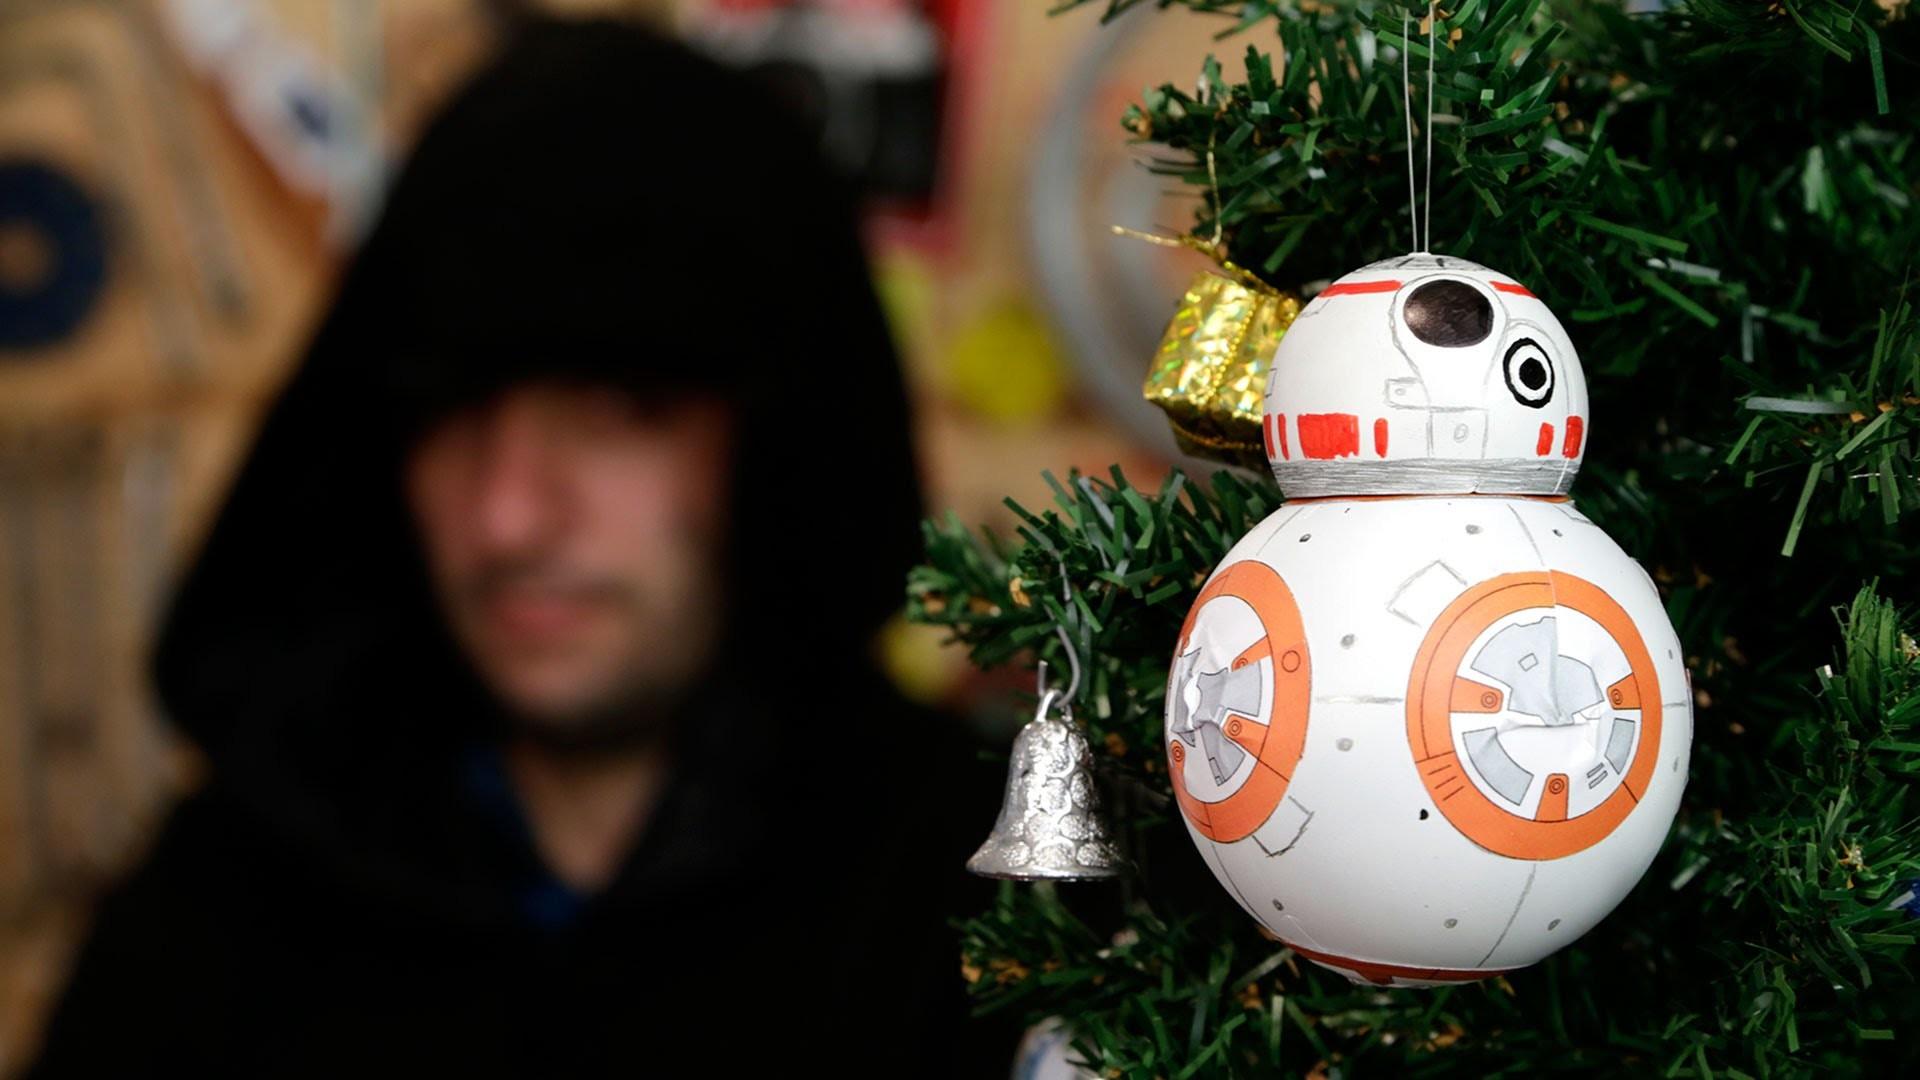 Bola de Natal do BB-8, o Robô do Star Wars